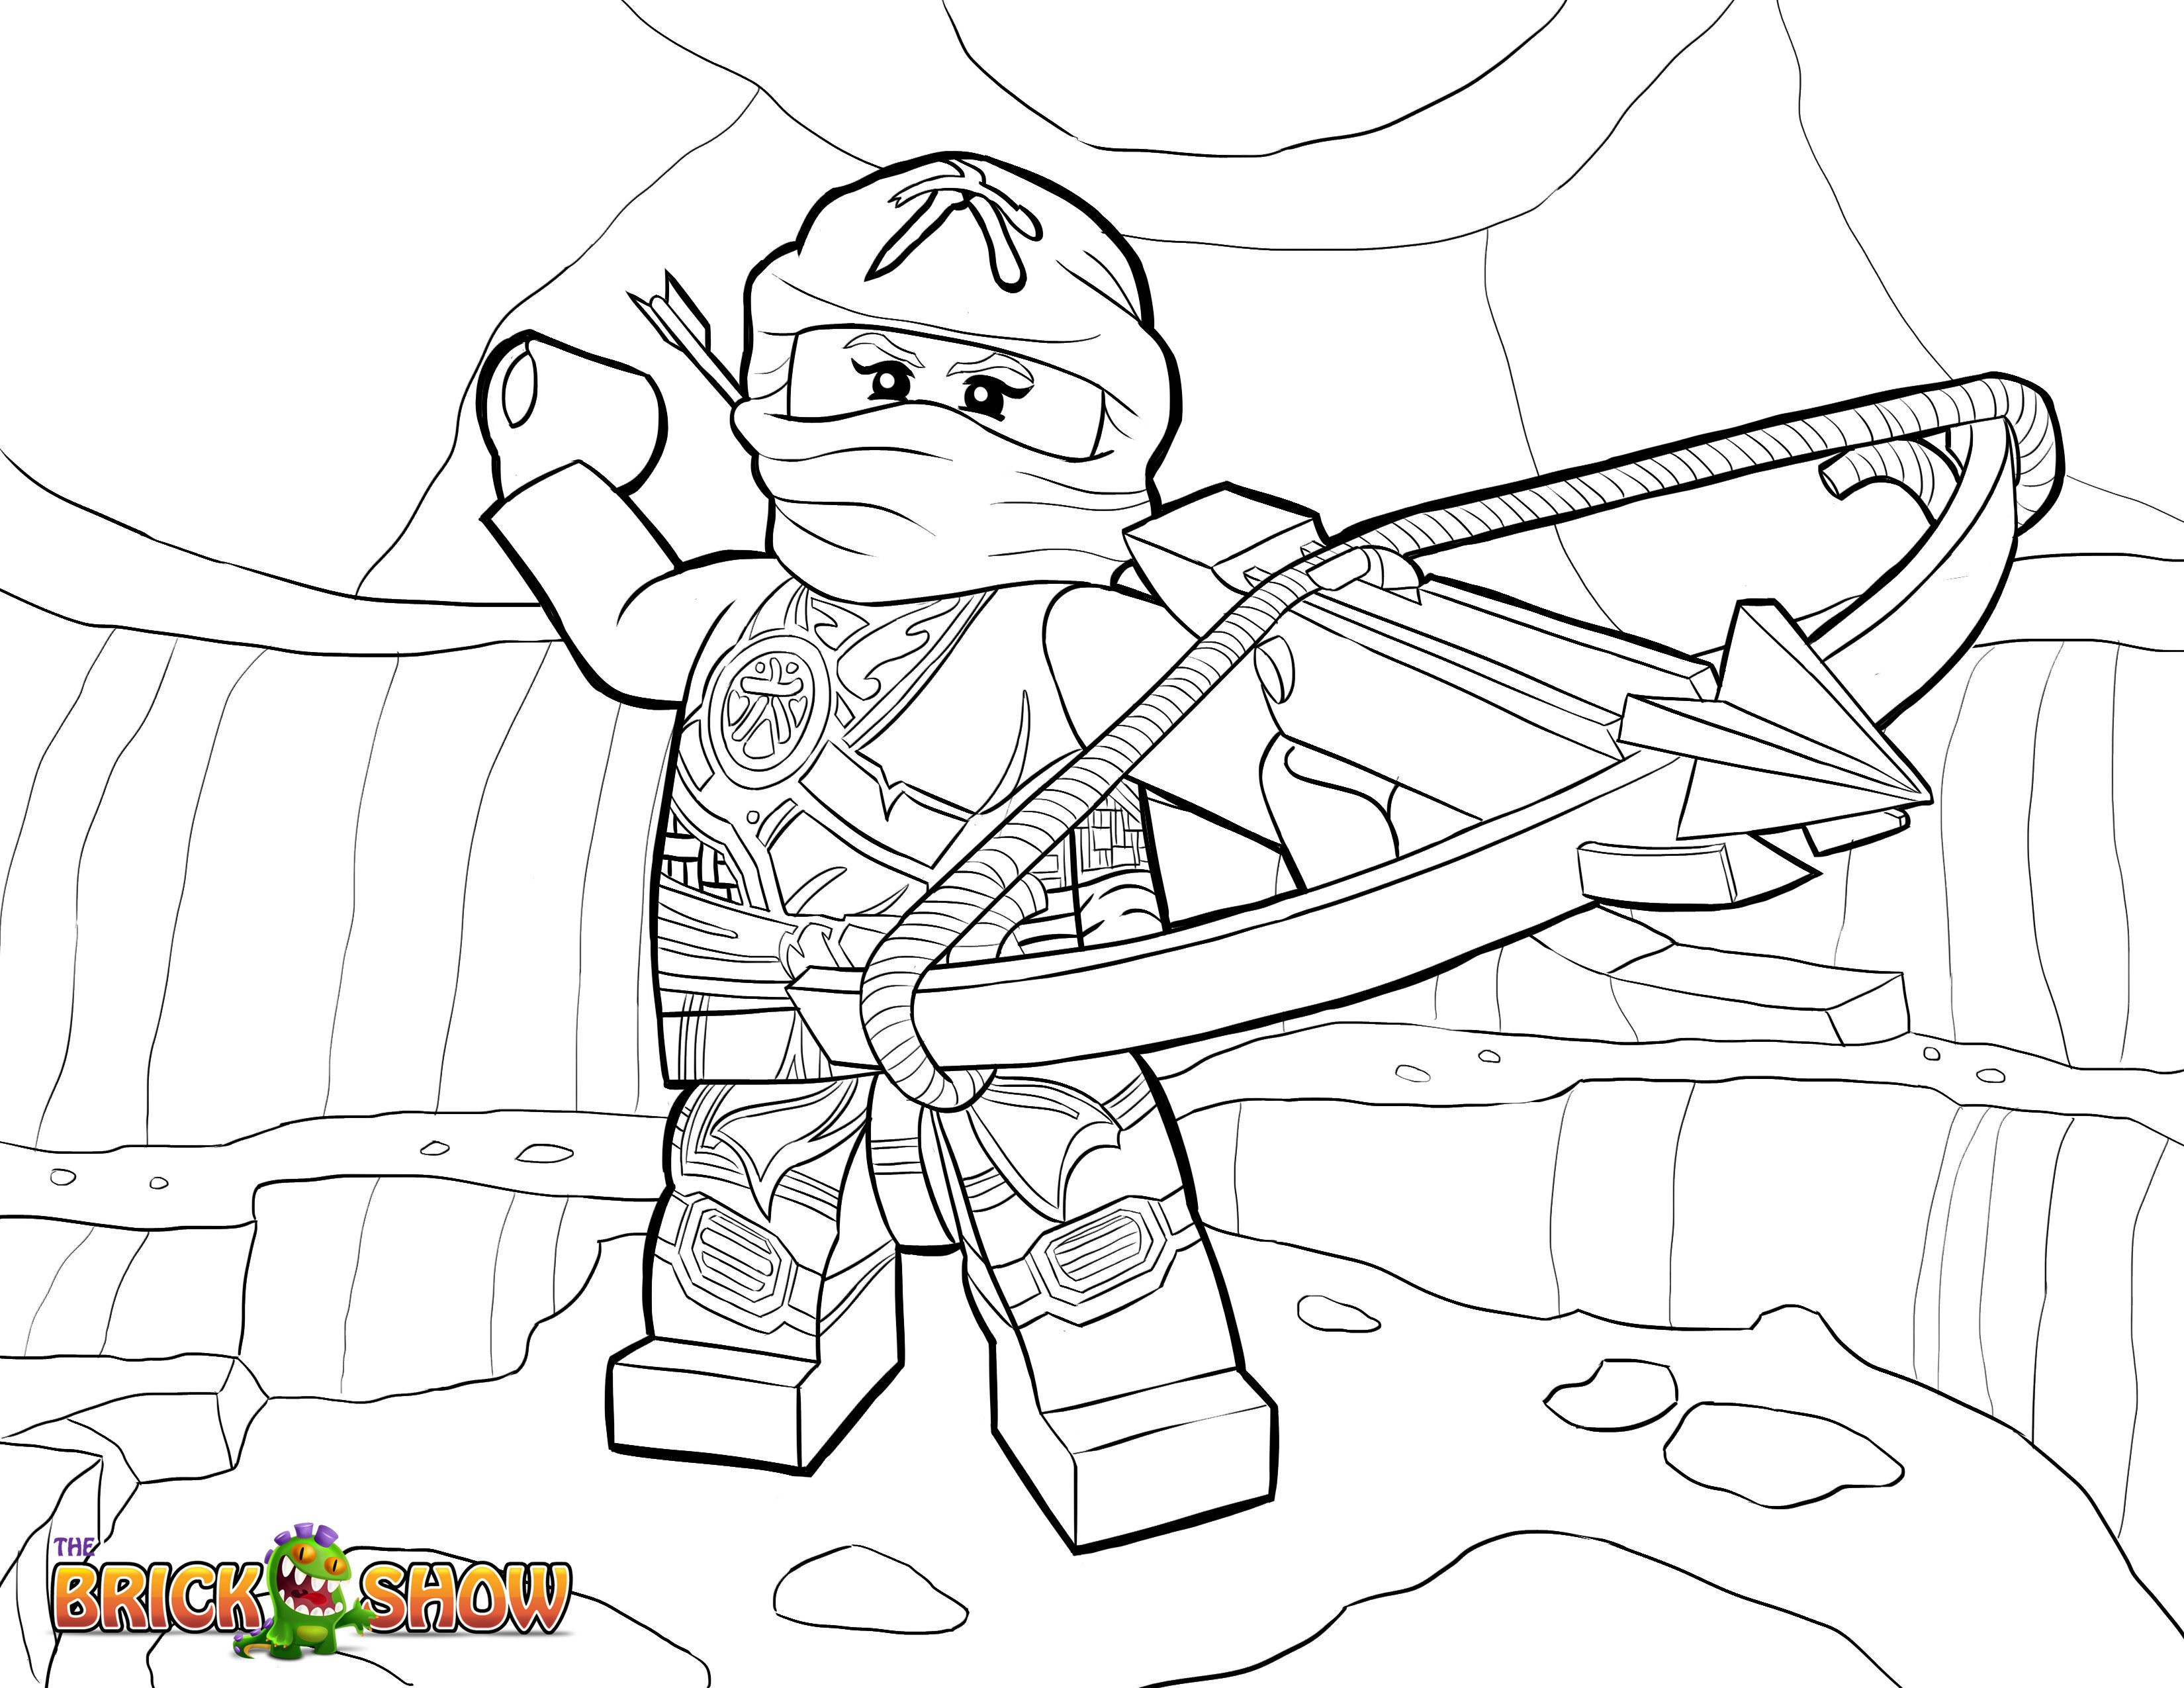 Ninjago Zane Ausmalbilder Das Beste Von 40 Ninjago Ausmalbilder Zane Scoredatscore Frisch Lego Elves Stock